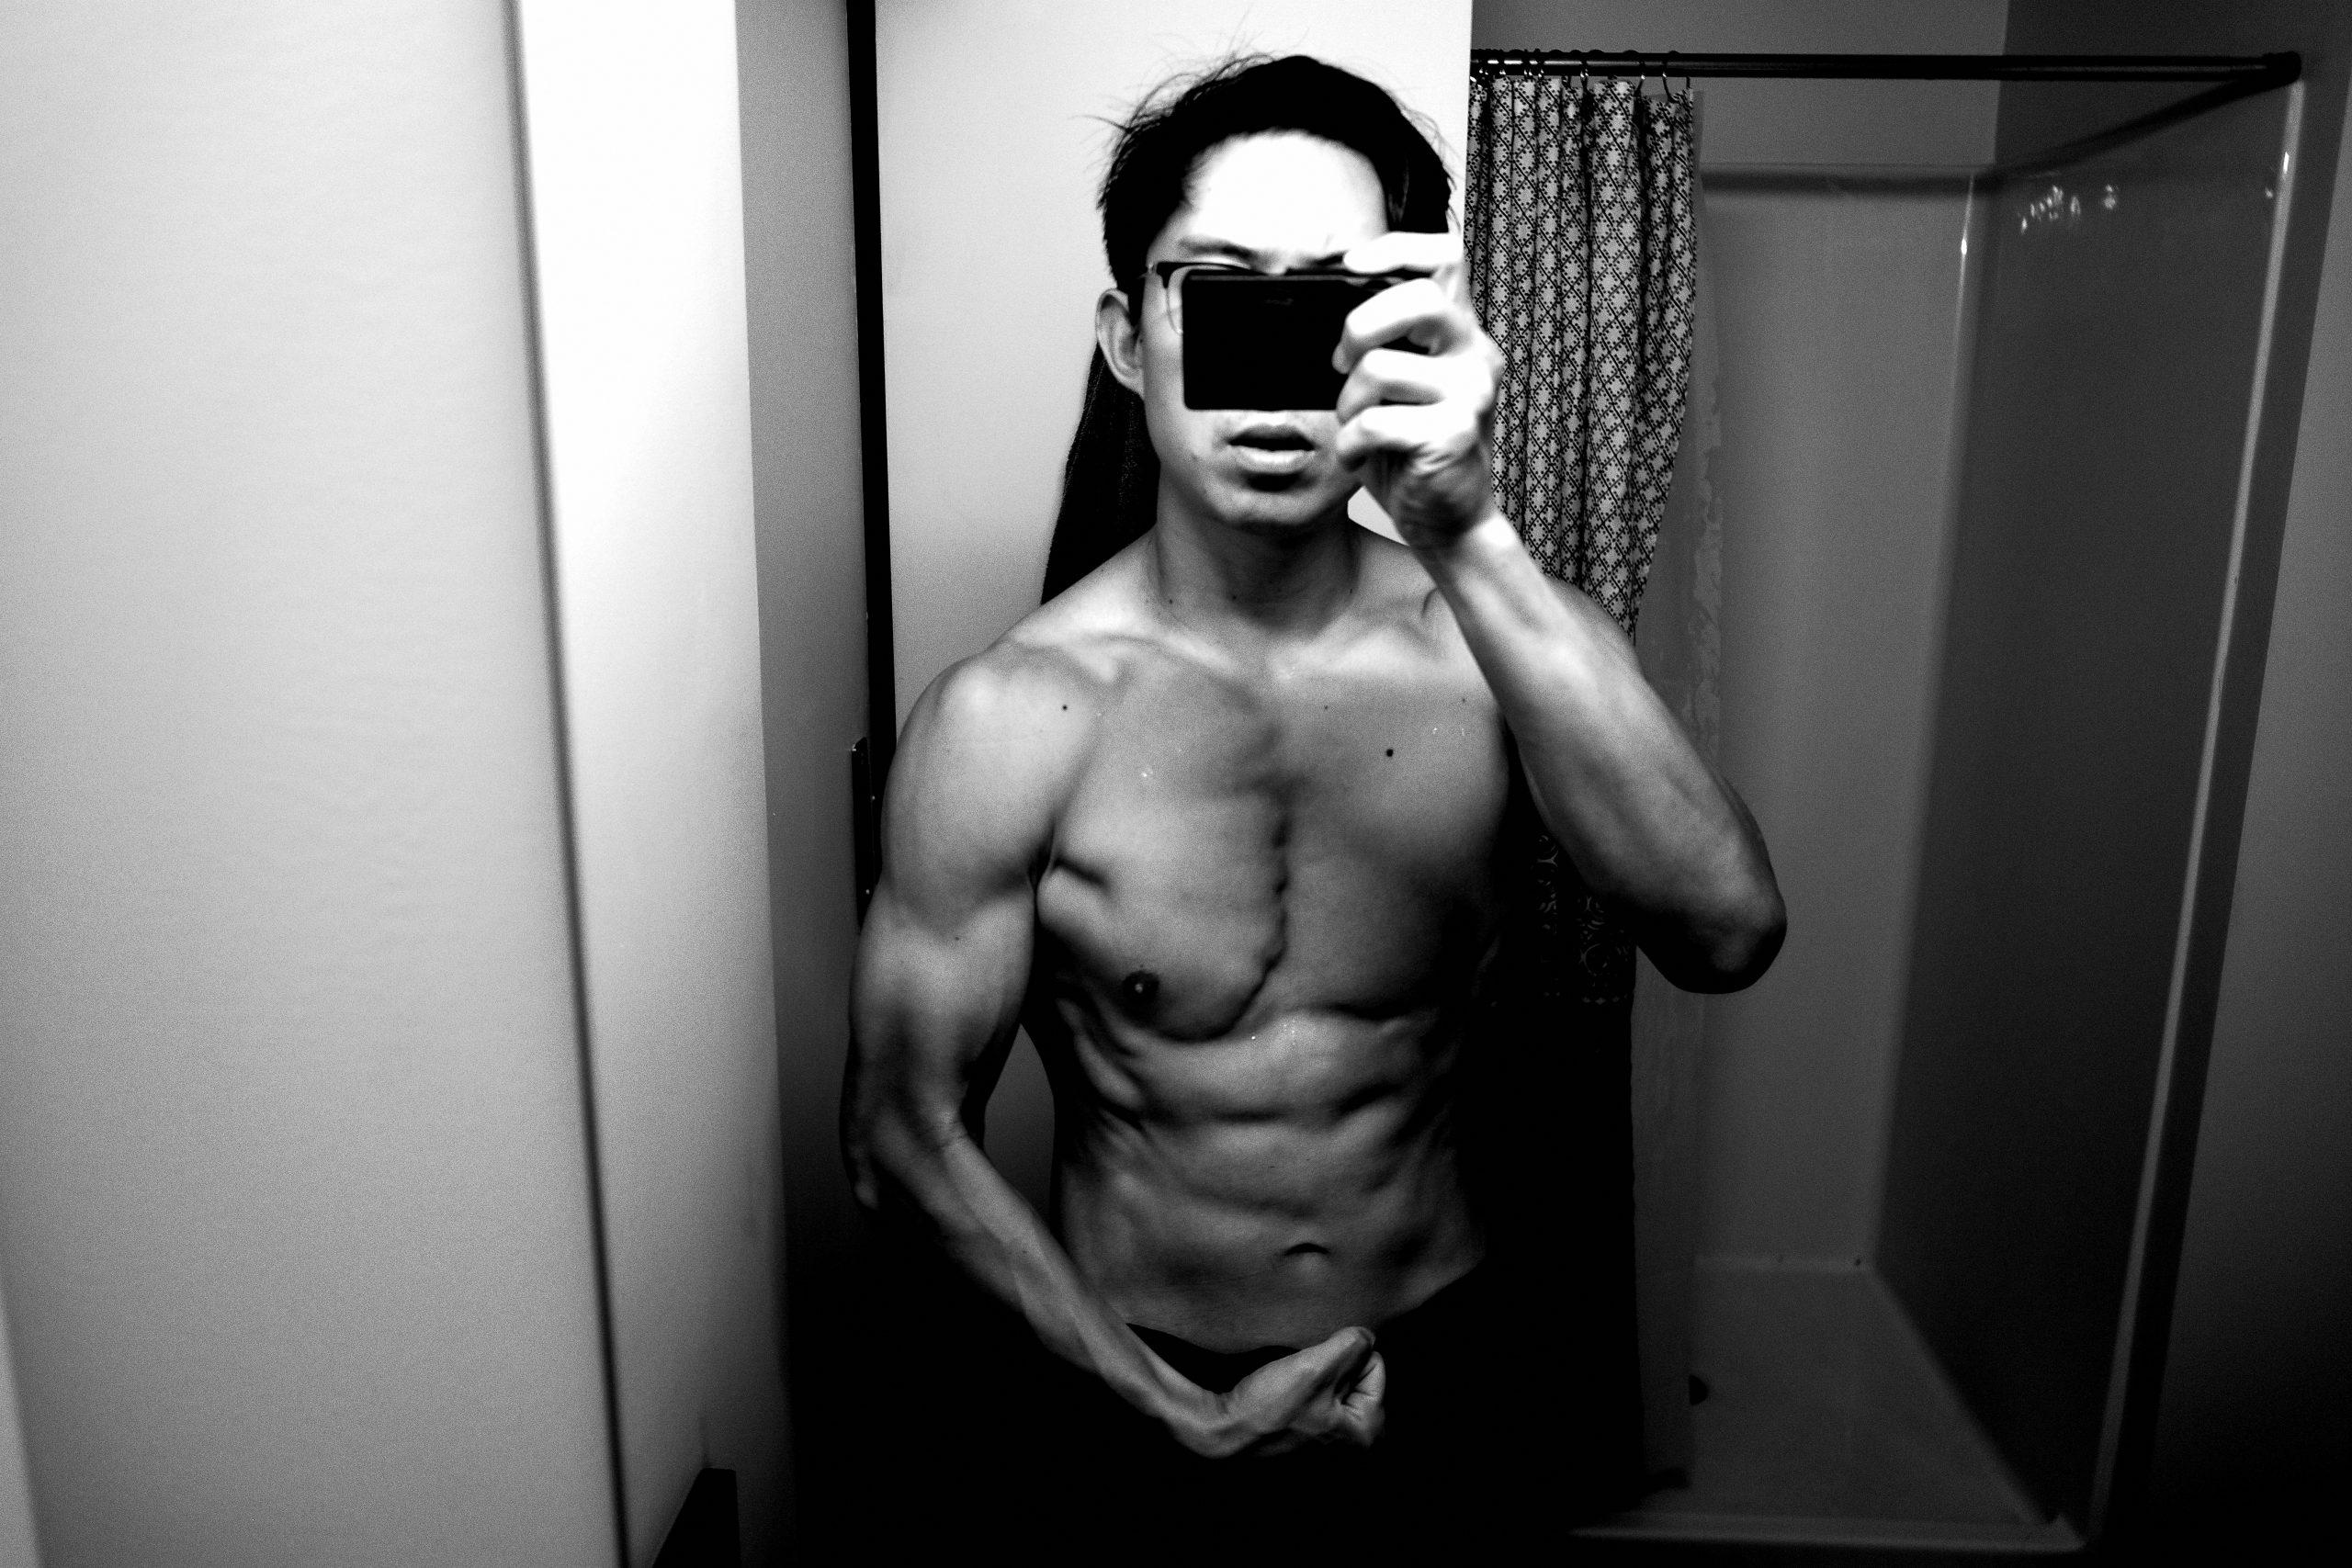 Eric flex muscle